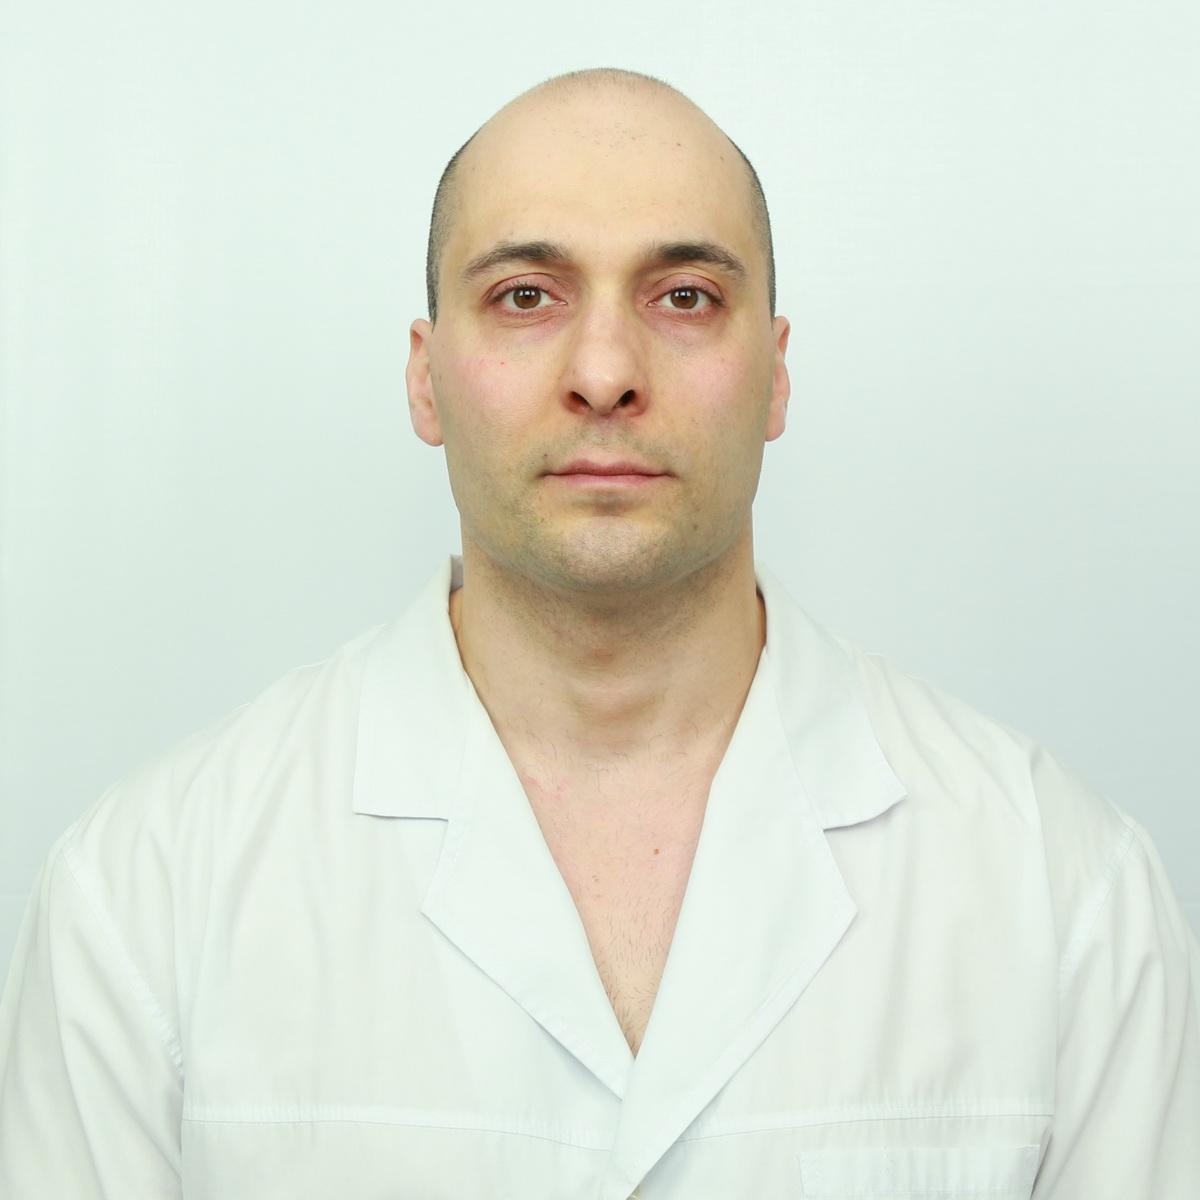 Дионисиос Каравасилиадис